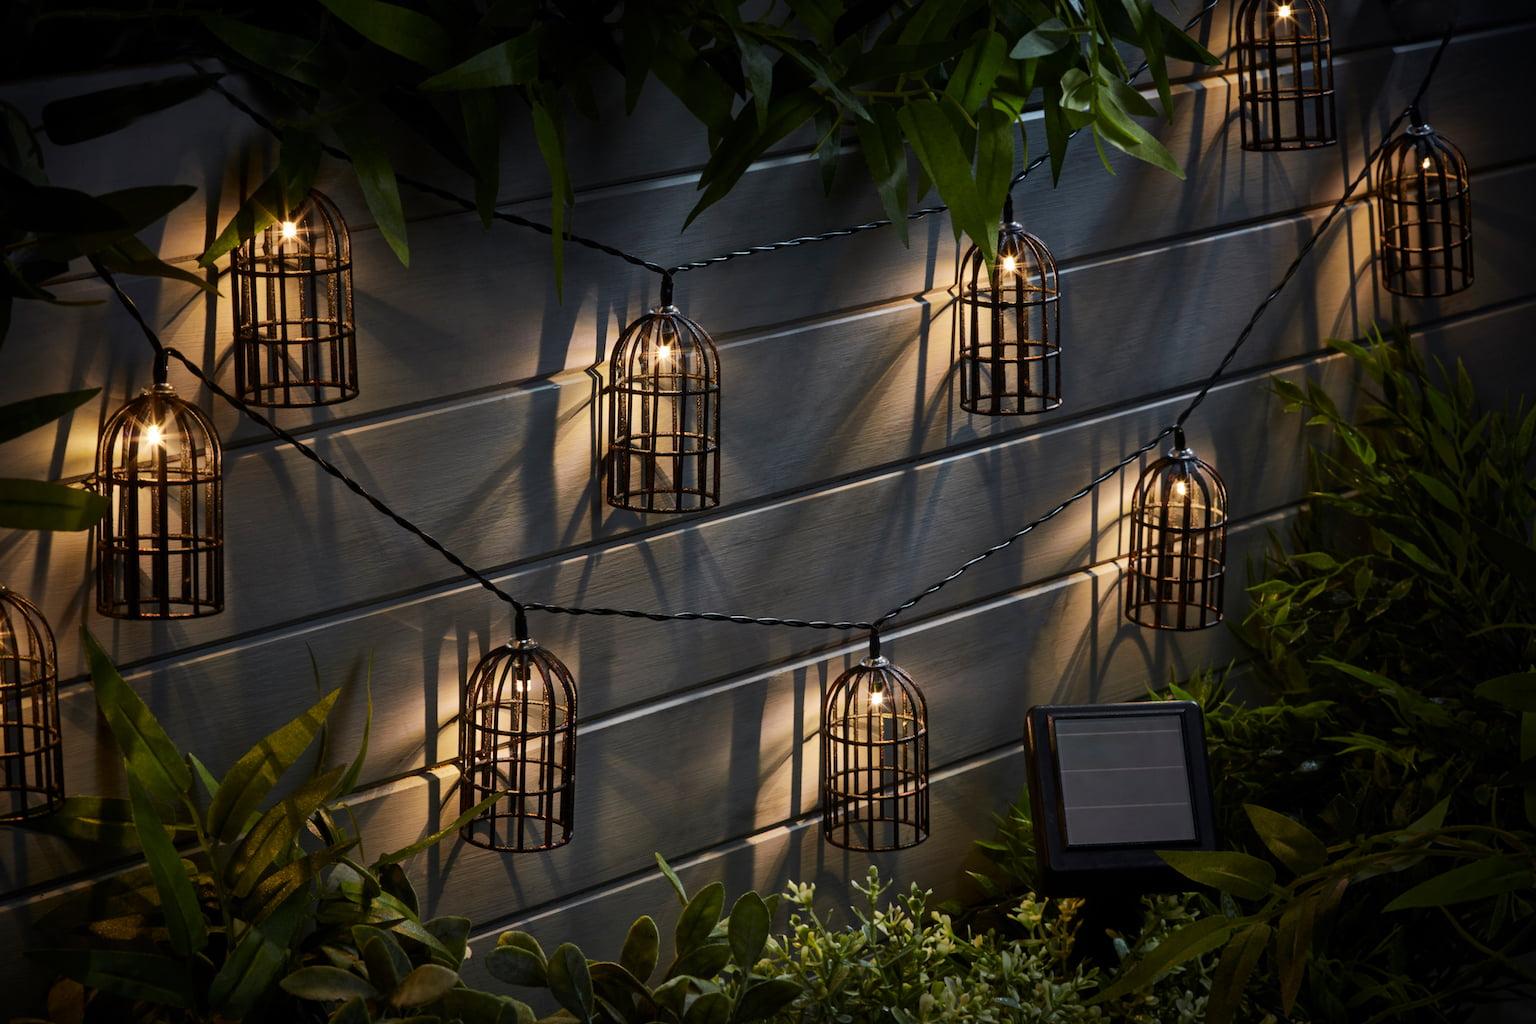 Birdcage Solar Lights